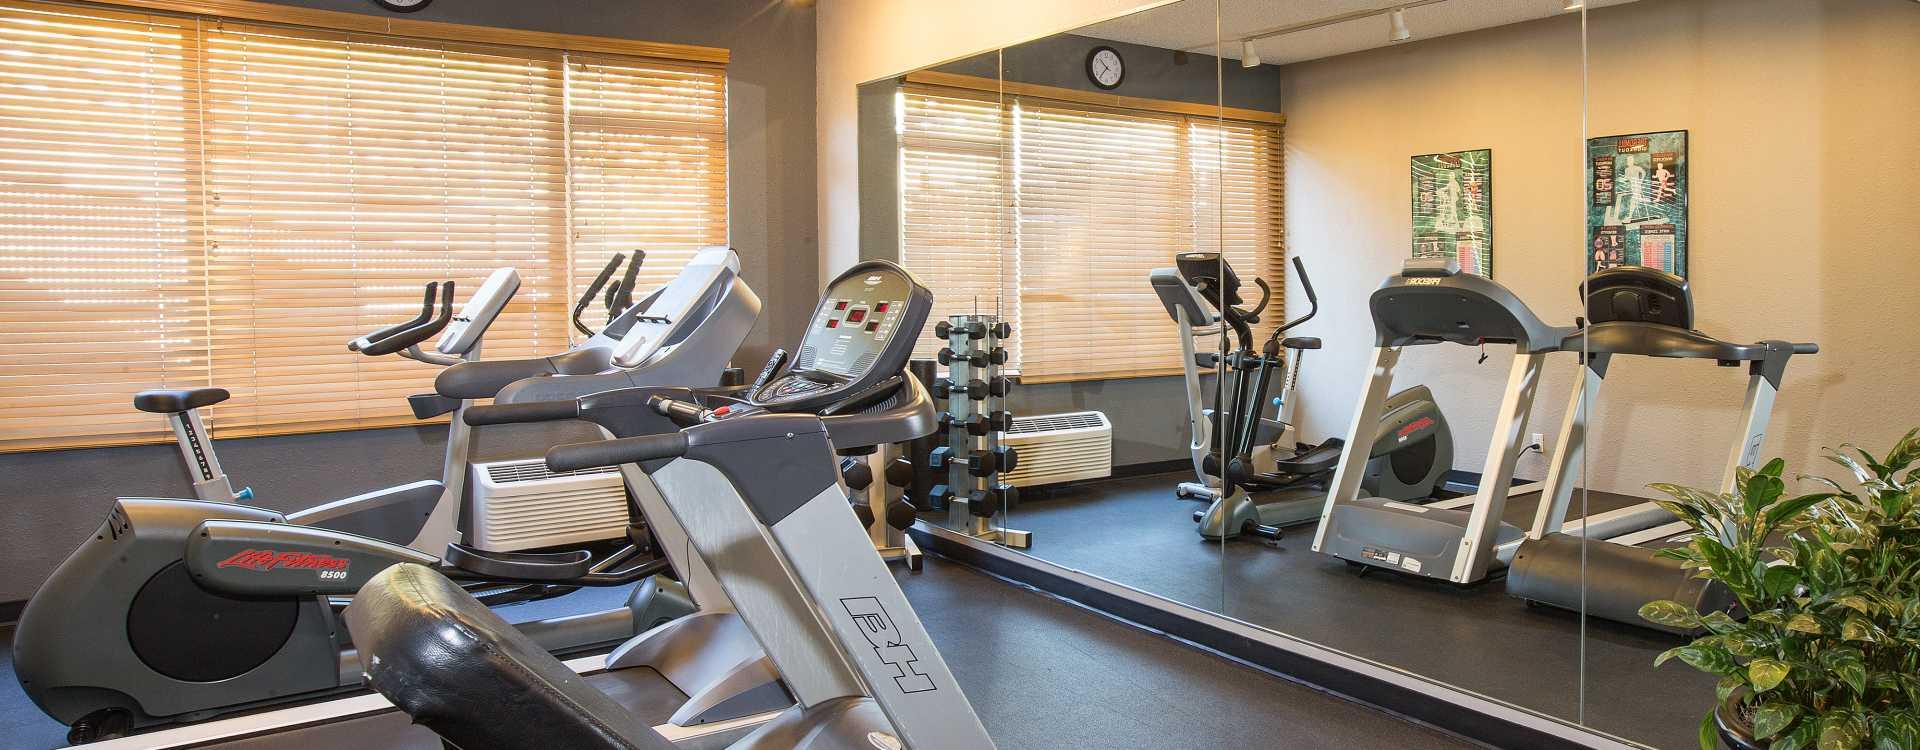 Coast Gateway Hotel Fitness Centre